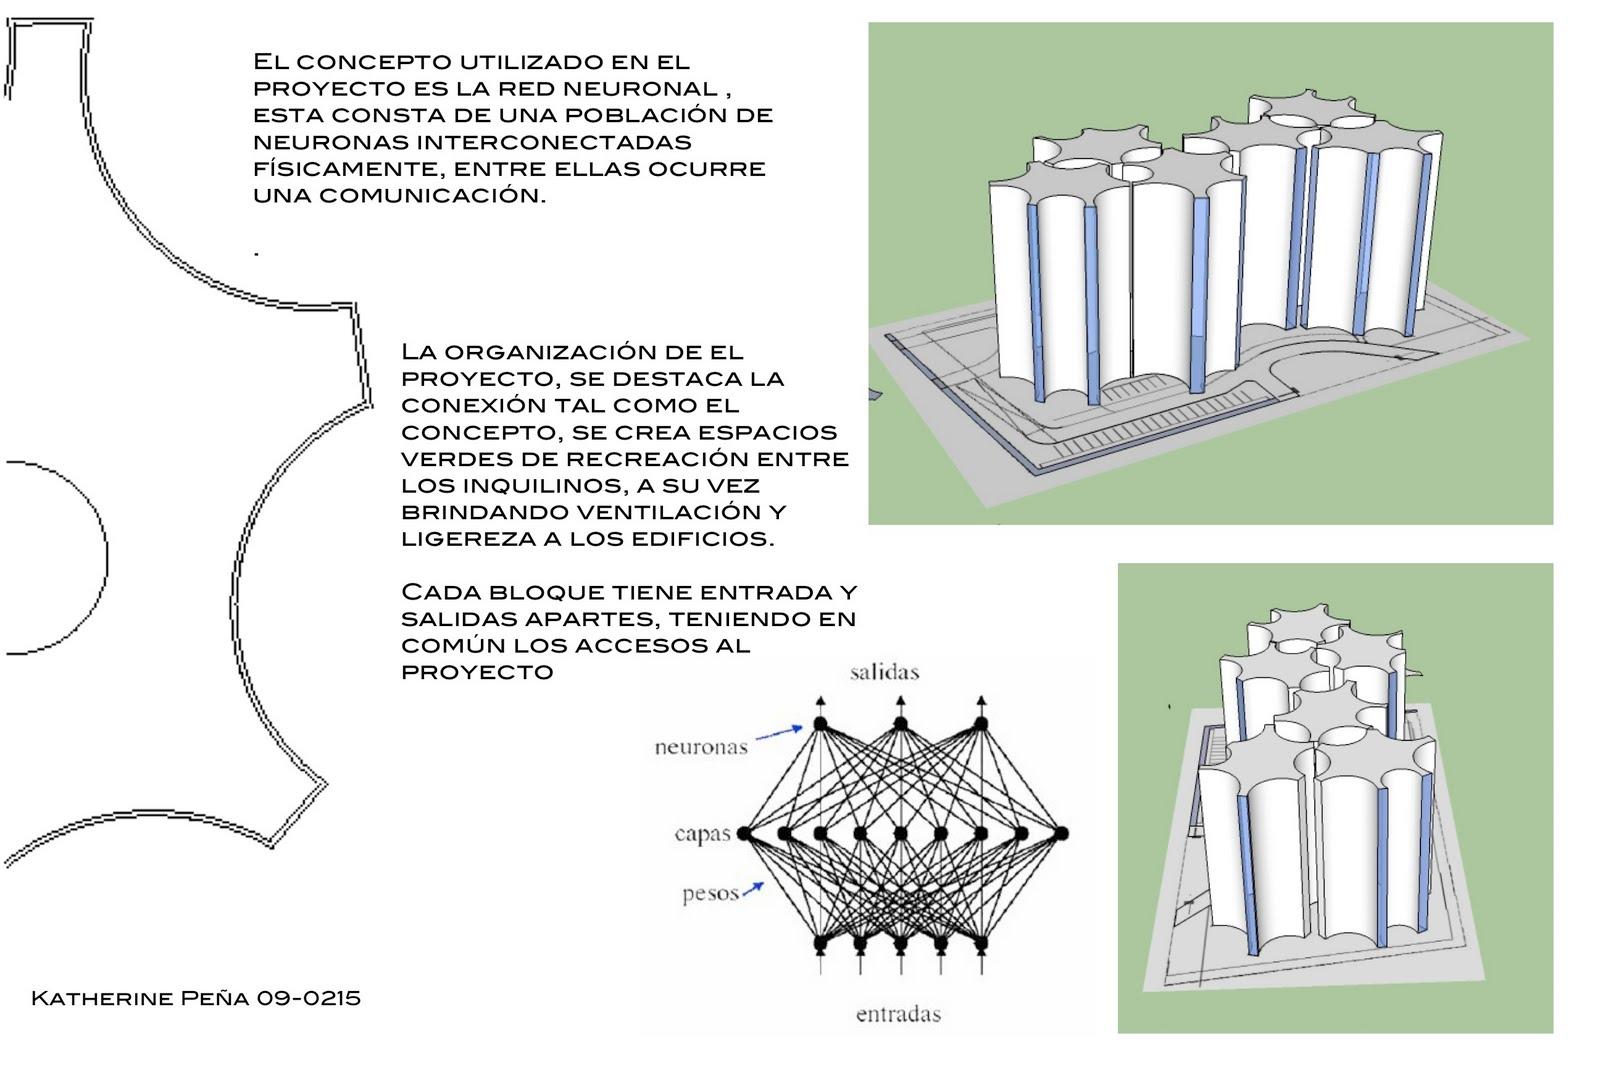 Dise o arquitect nico vi magaly caba 2010 for Concepto de arquitectura